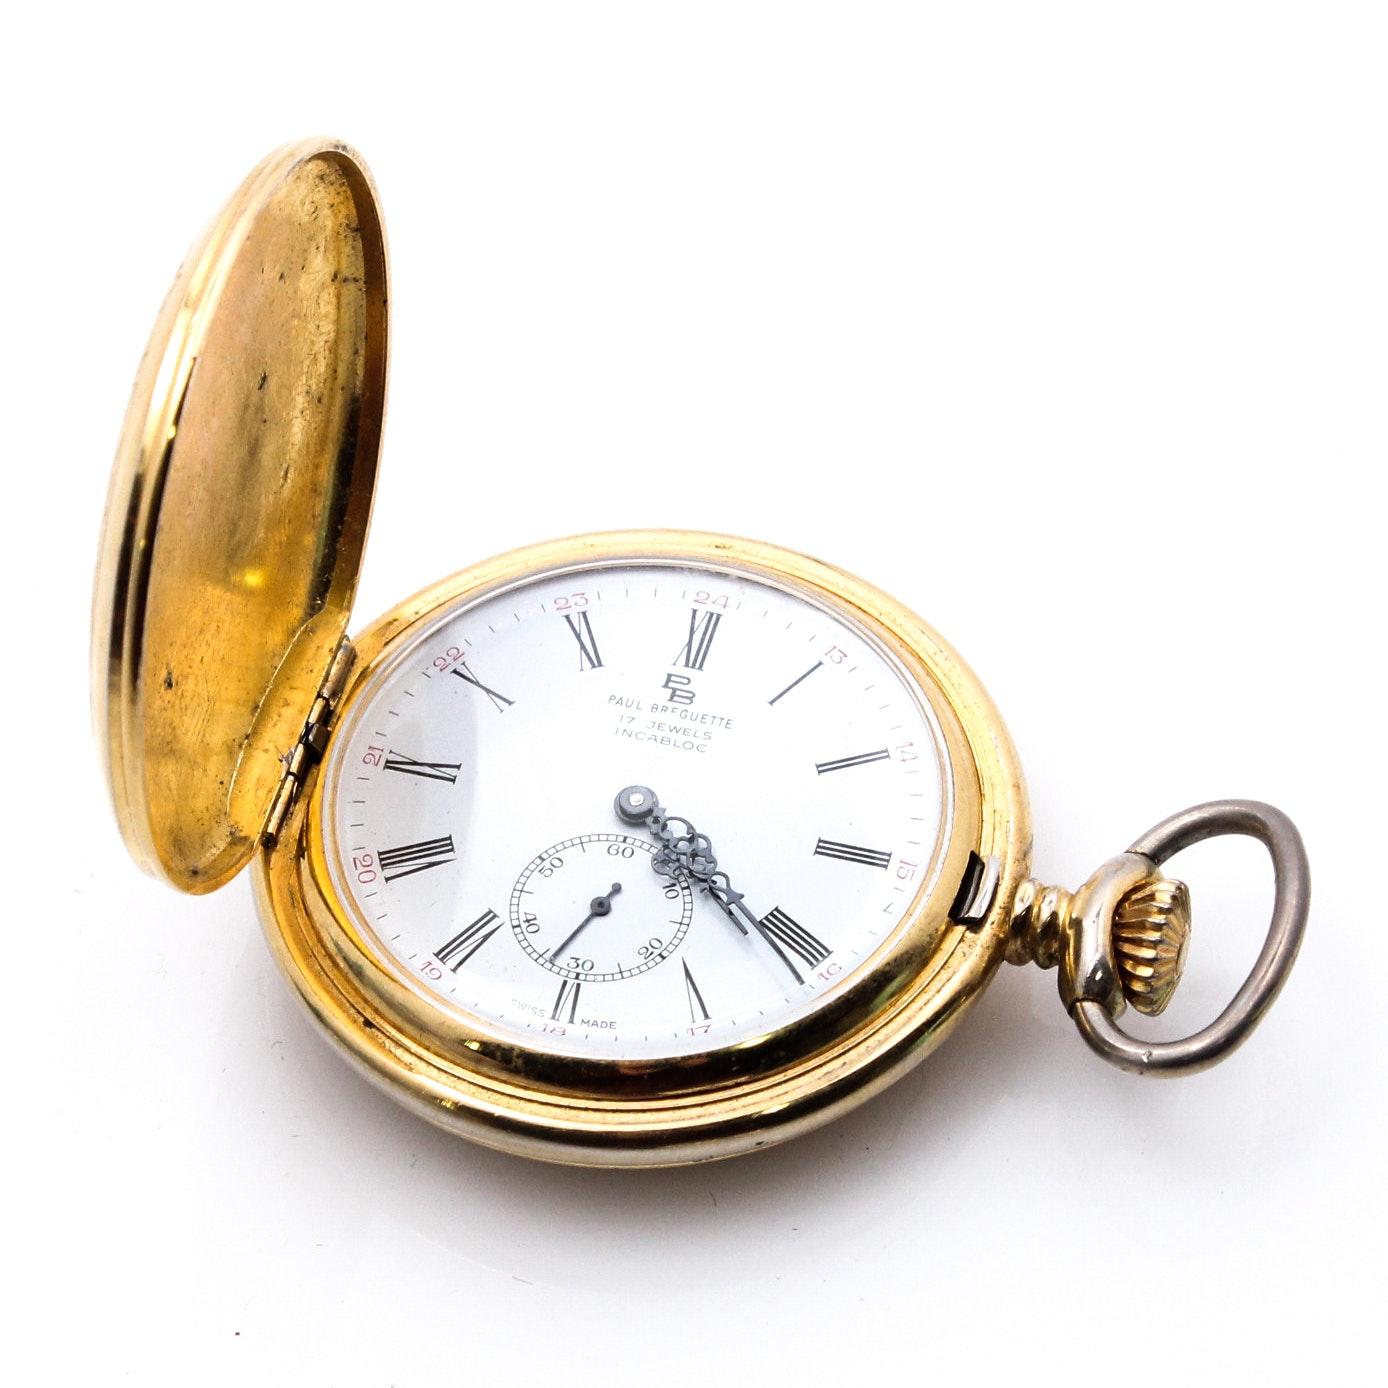 Paul Breguette Gold Tone 17 Jewel Pocket Watch